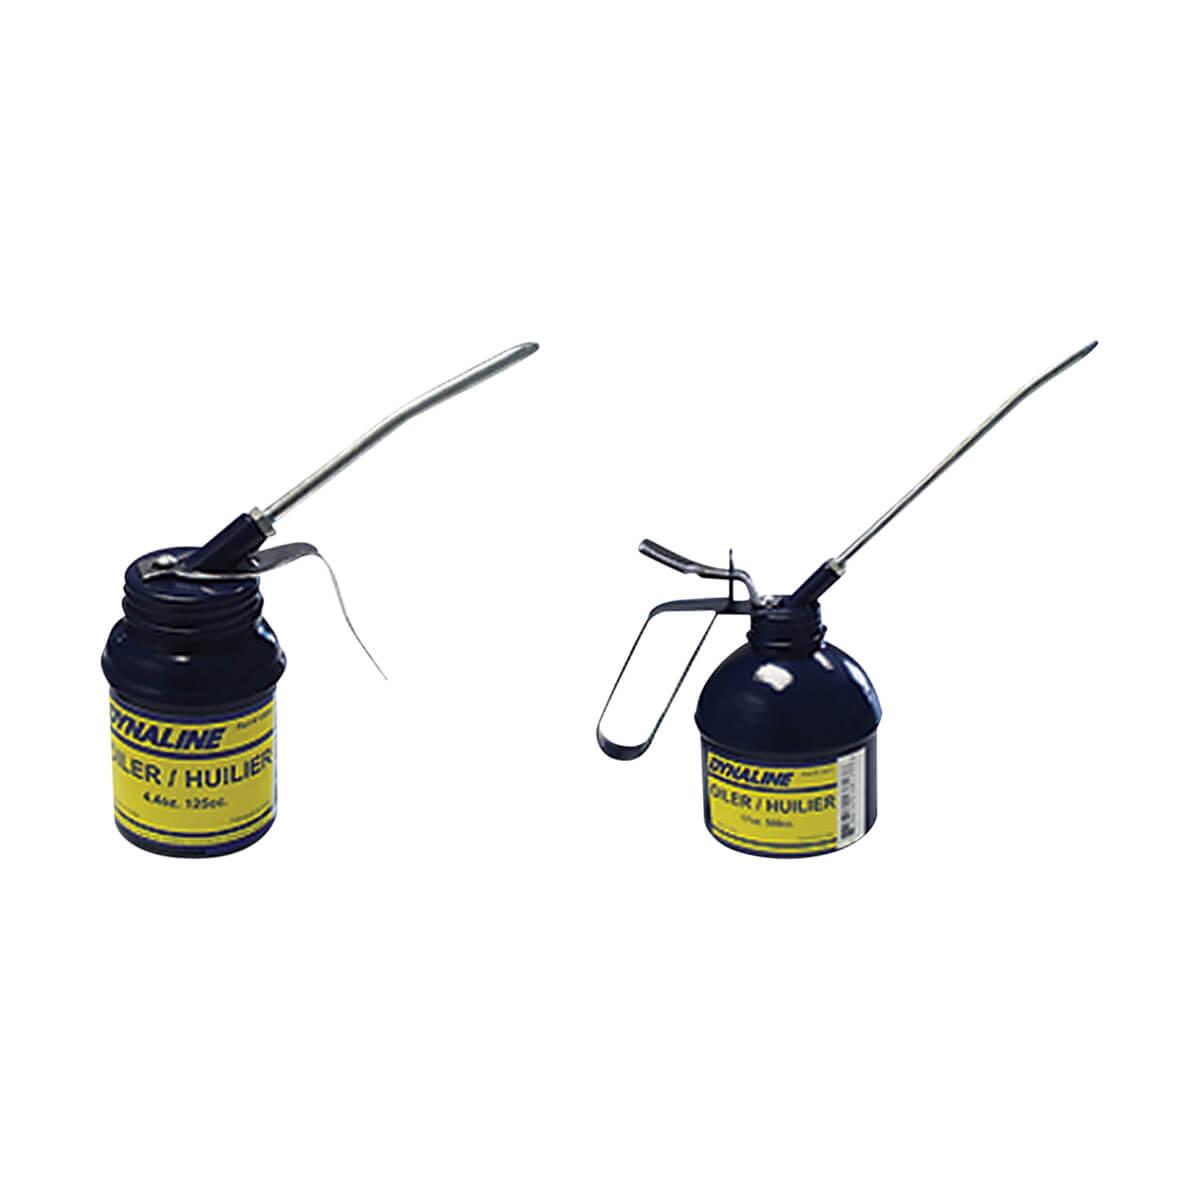 Pump Oiler 24 oz (700cc)